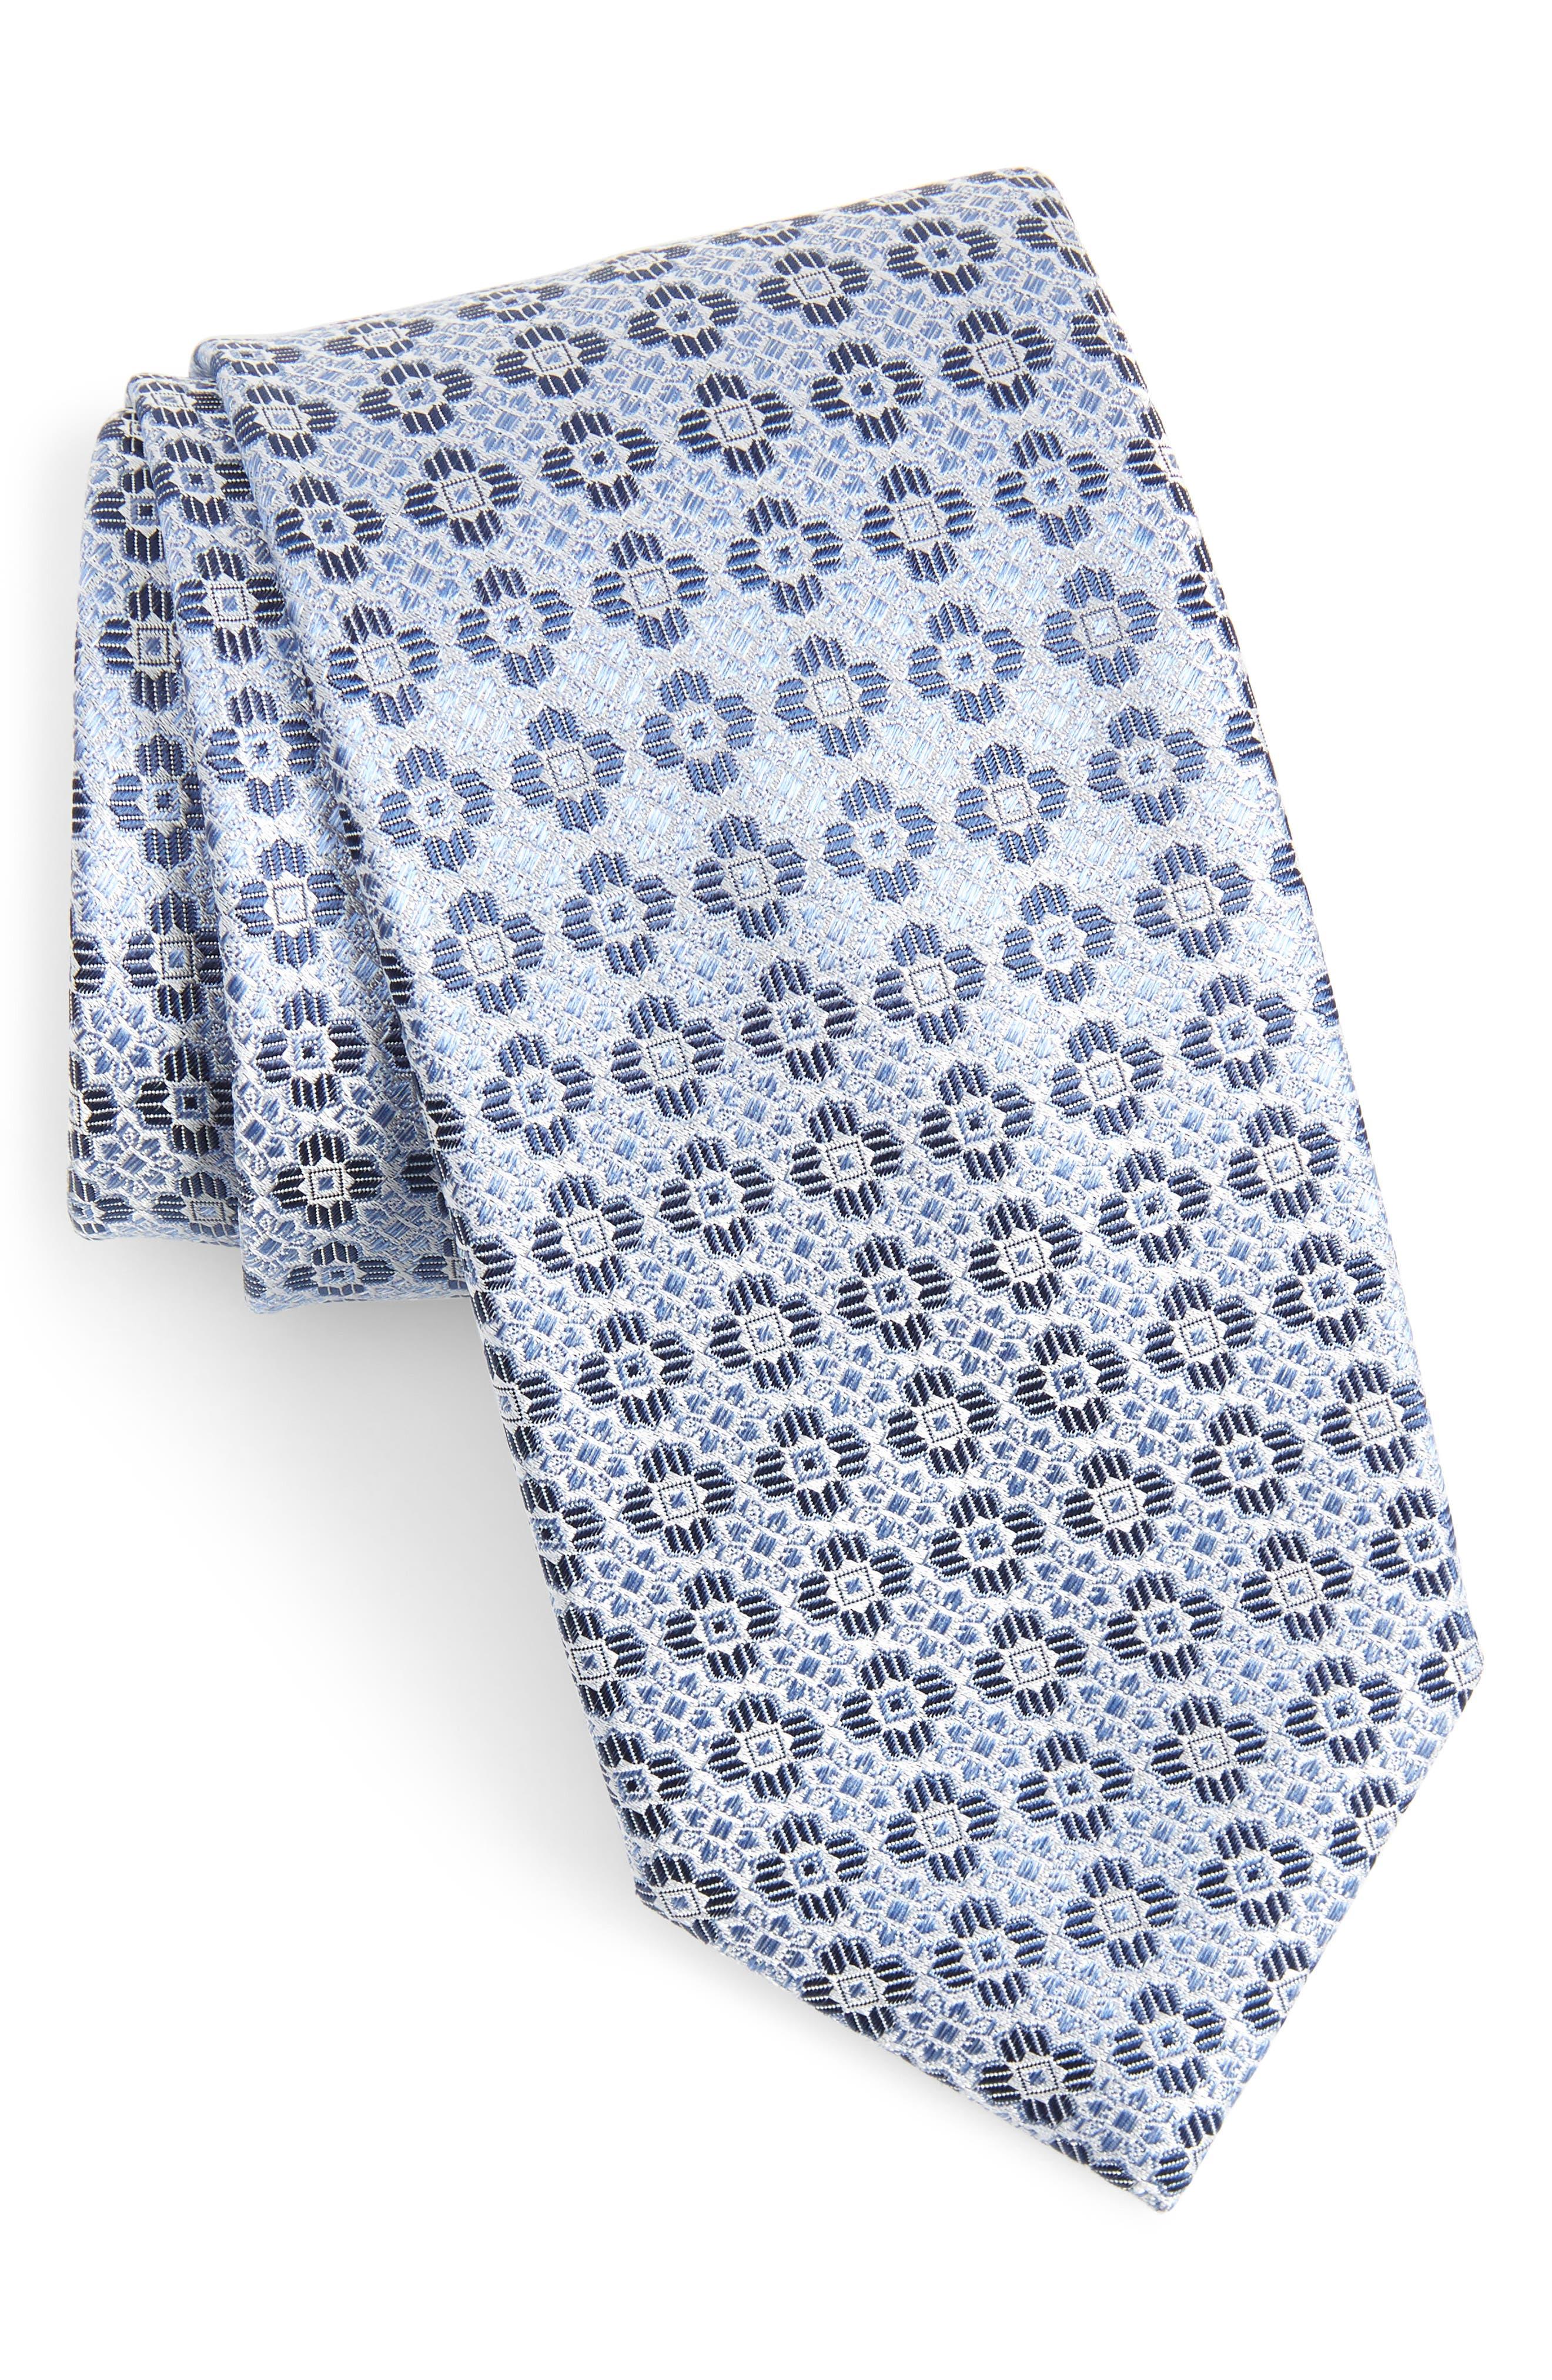 CANALI, Medallion Silk Tie, Main thumbnail 1, color, LIGHT BLUE